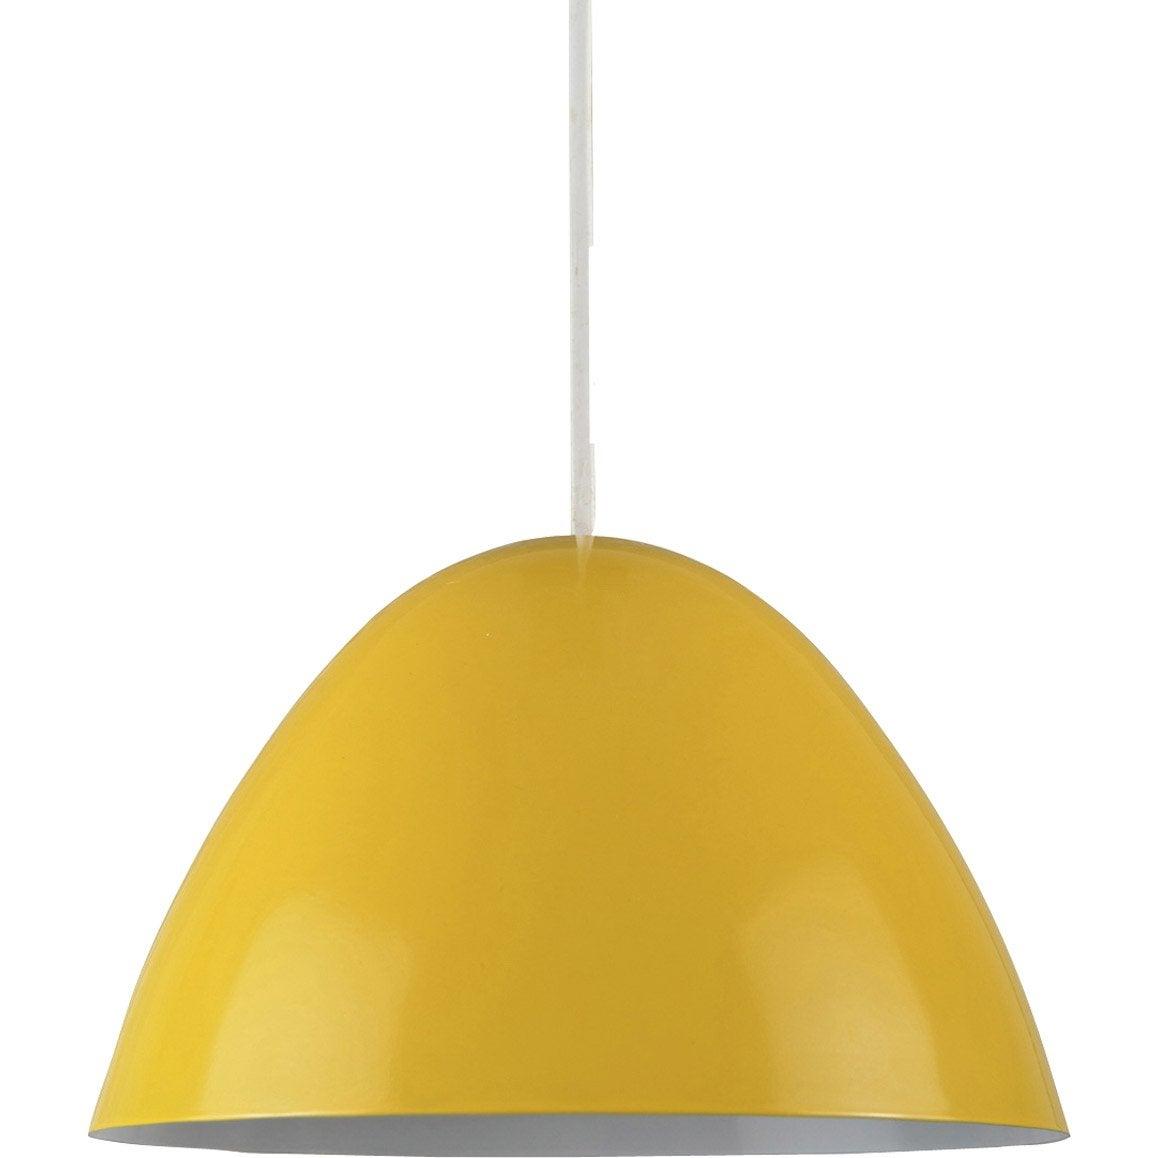 suspension nissa boudet jaune 60 watts diam 20 cm leroy merlin. Black Bedroom Furniture Sets. Home Design Ideas